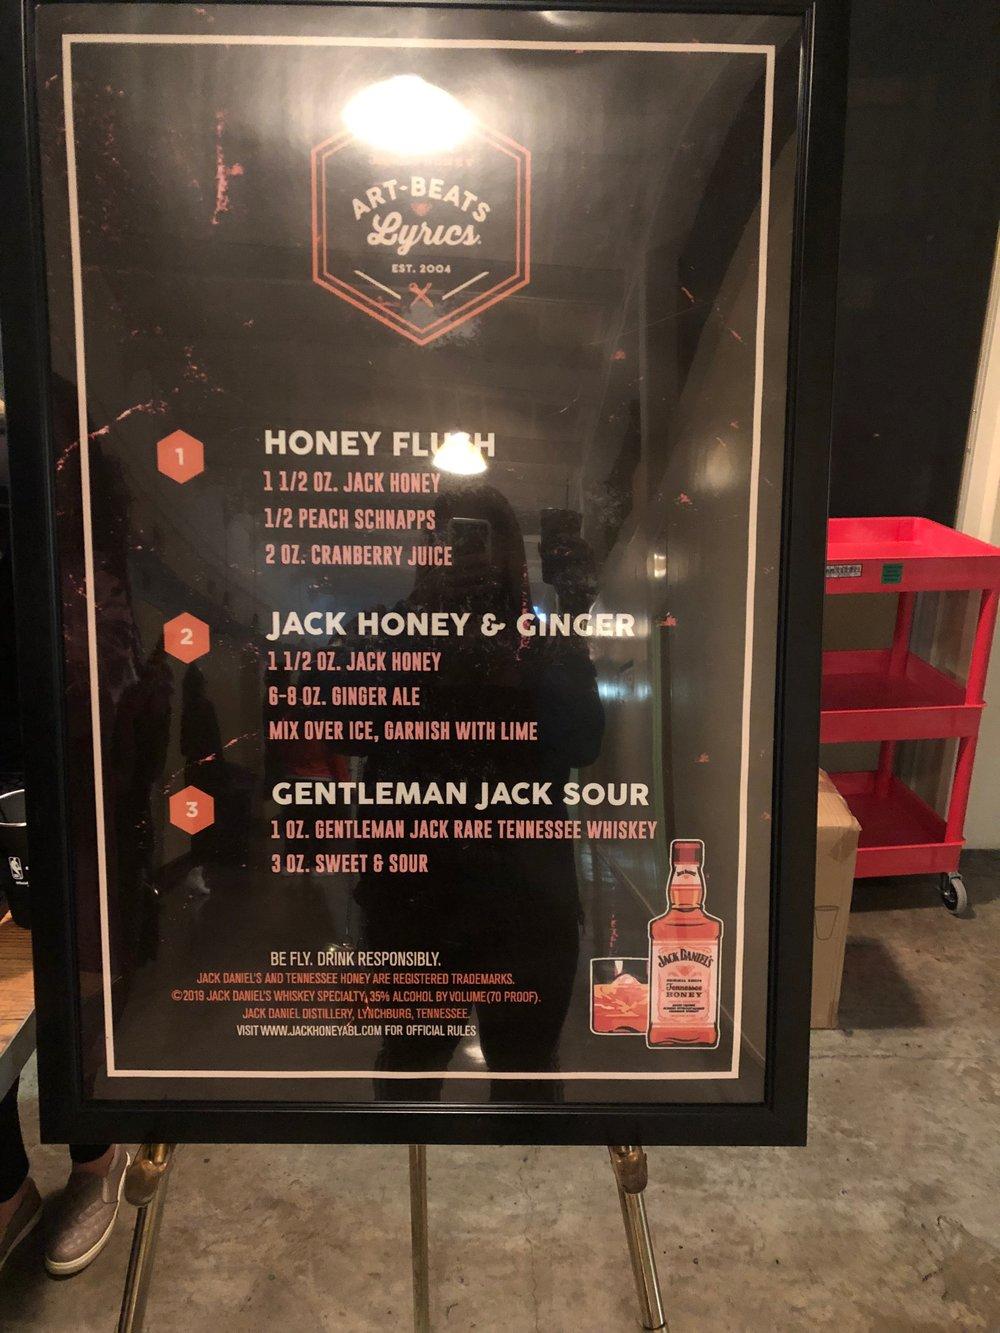 The drink menu at AB + L